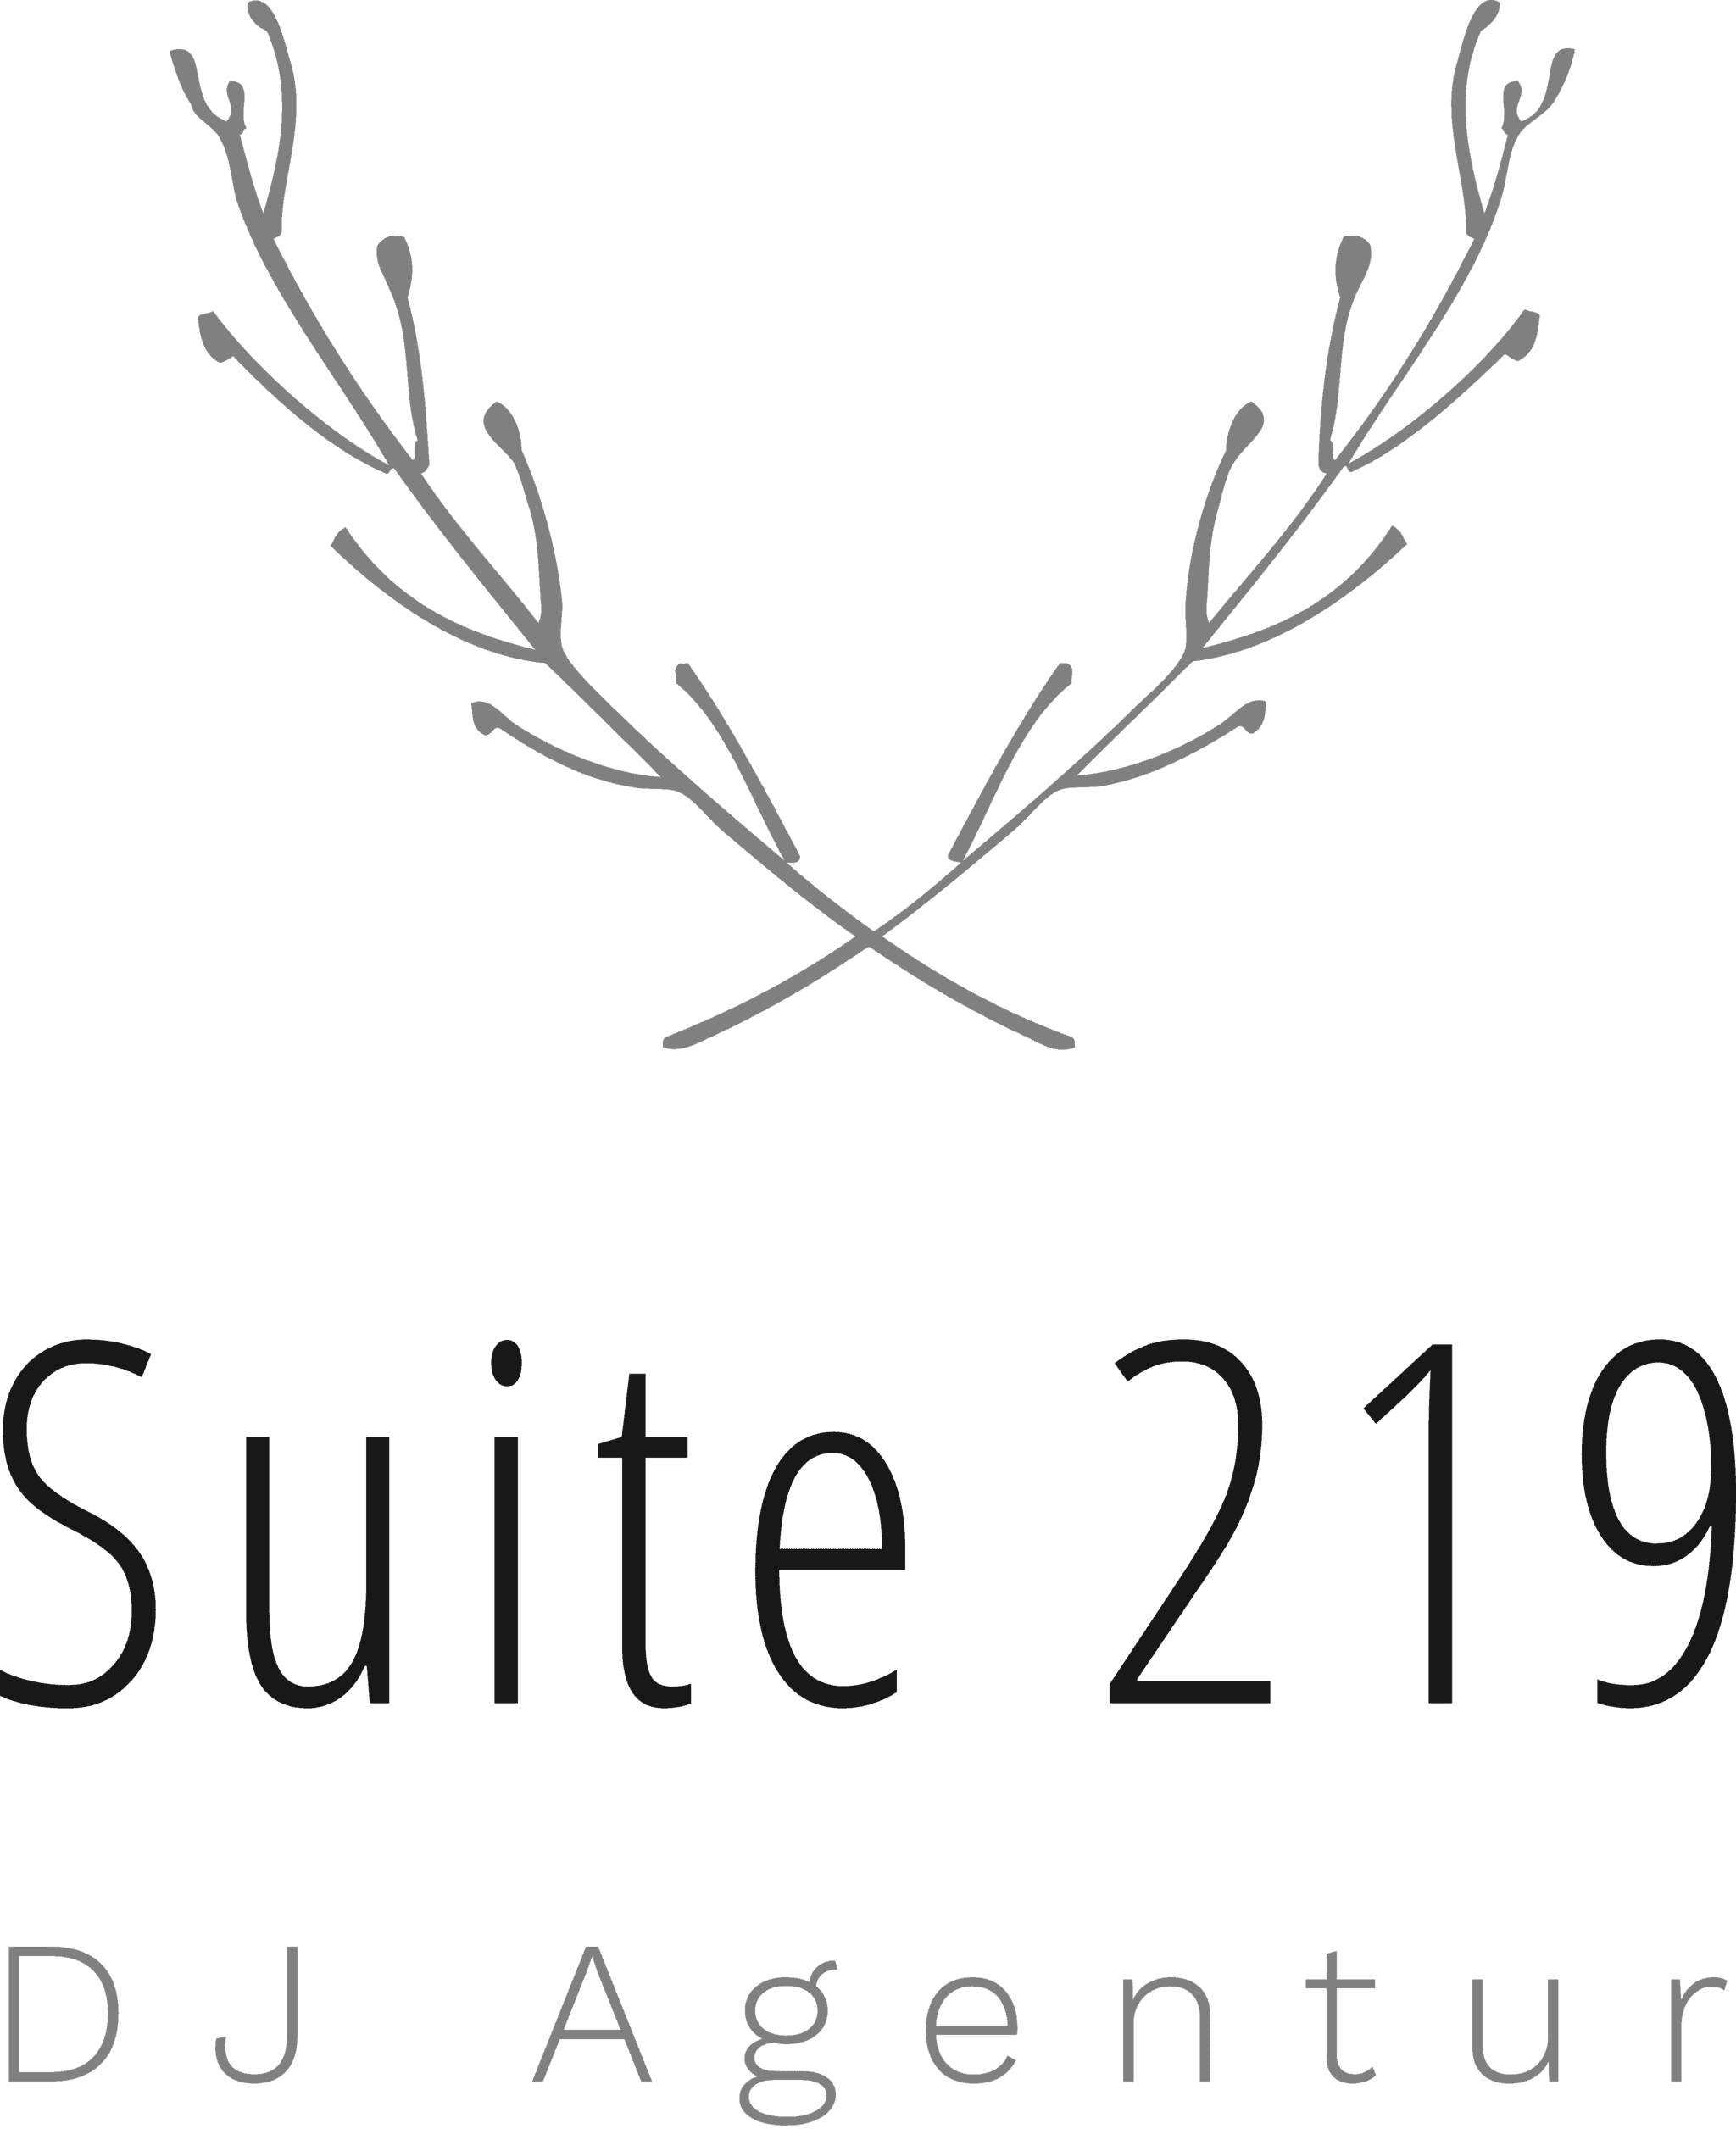 Logo Suite 219 DJ